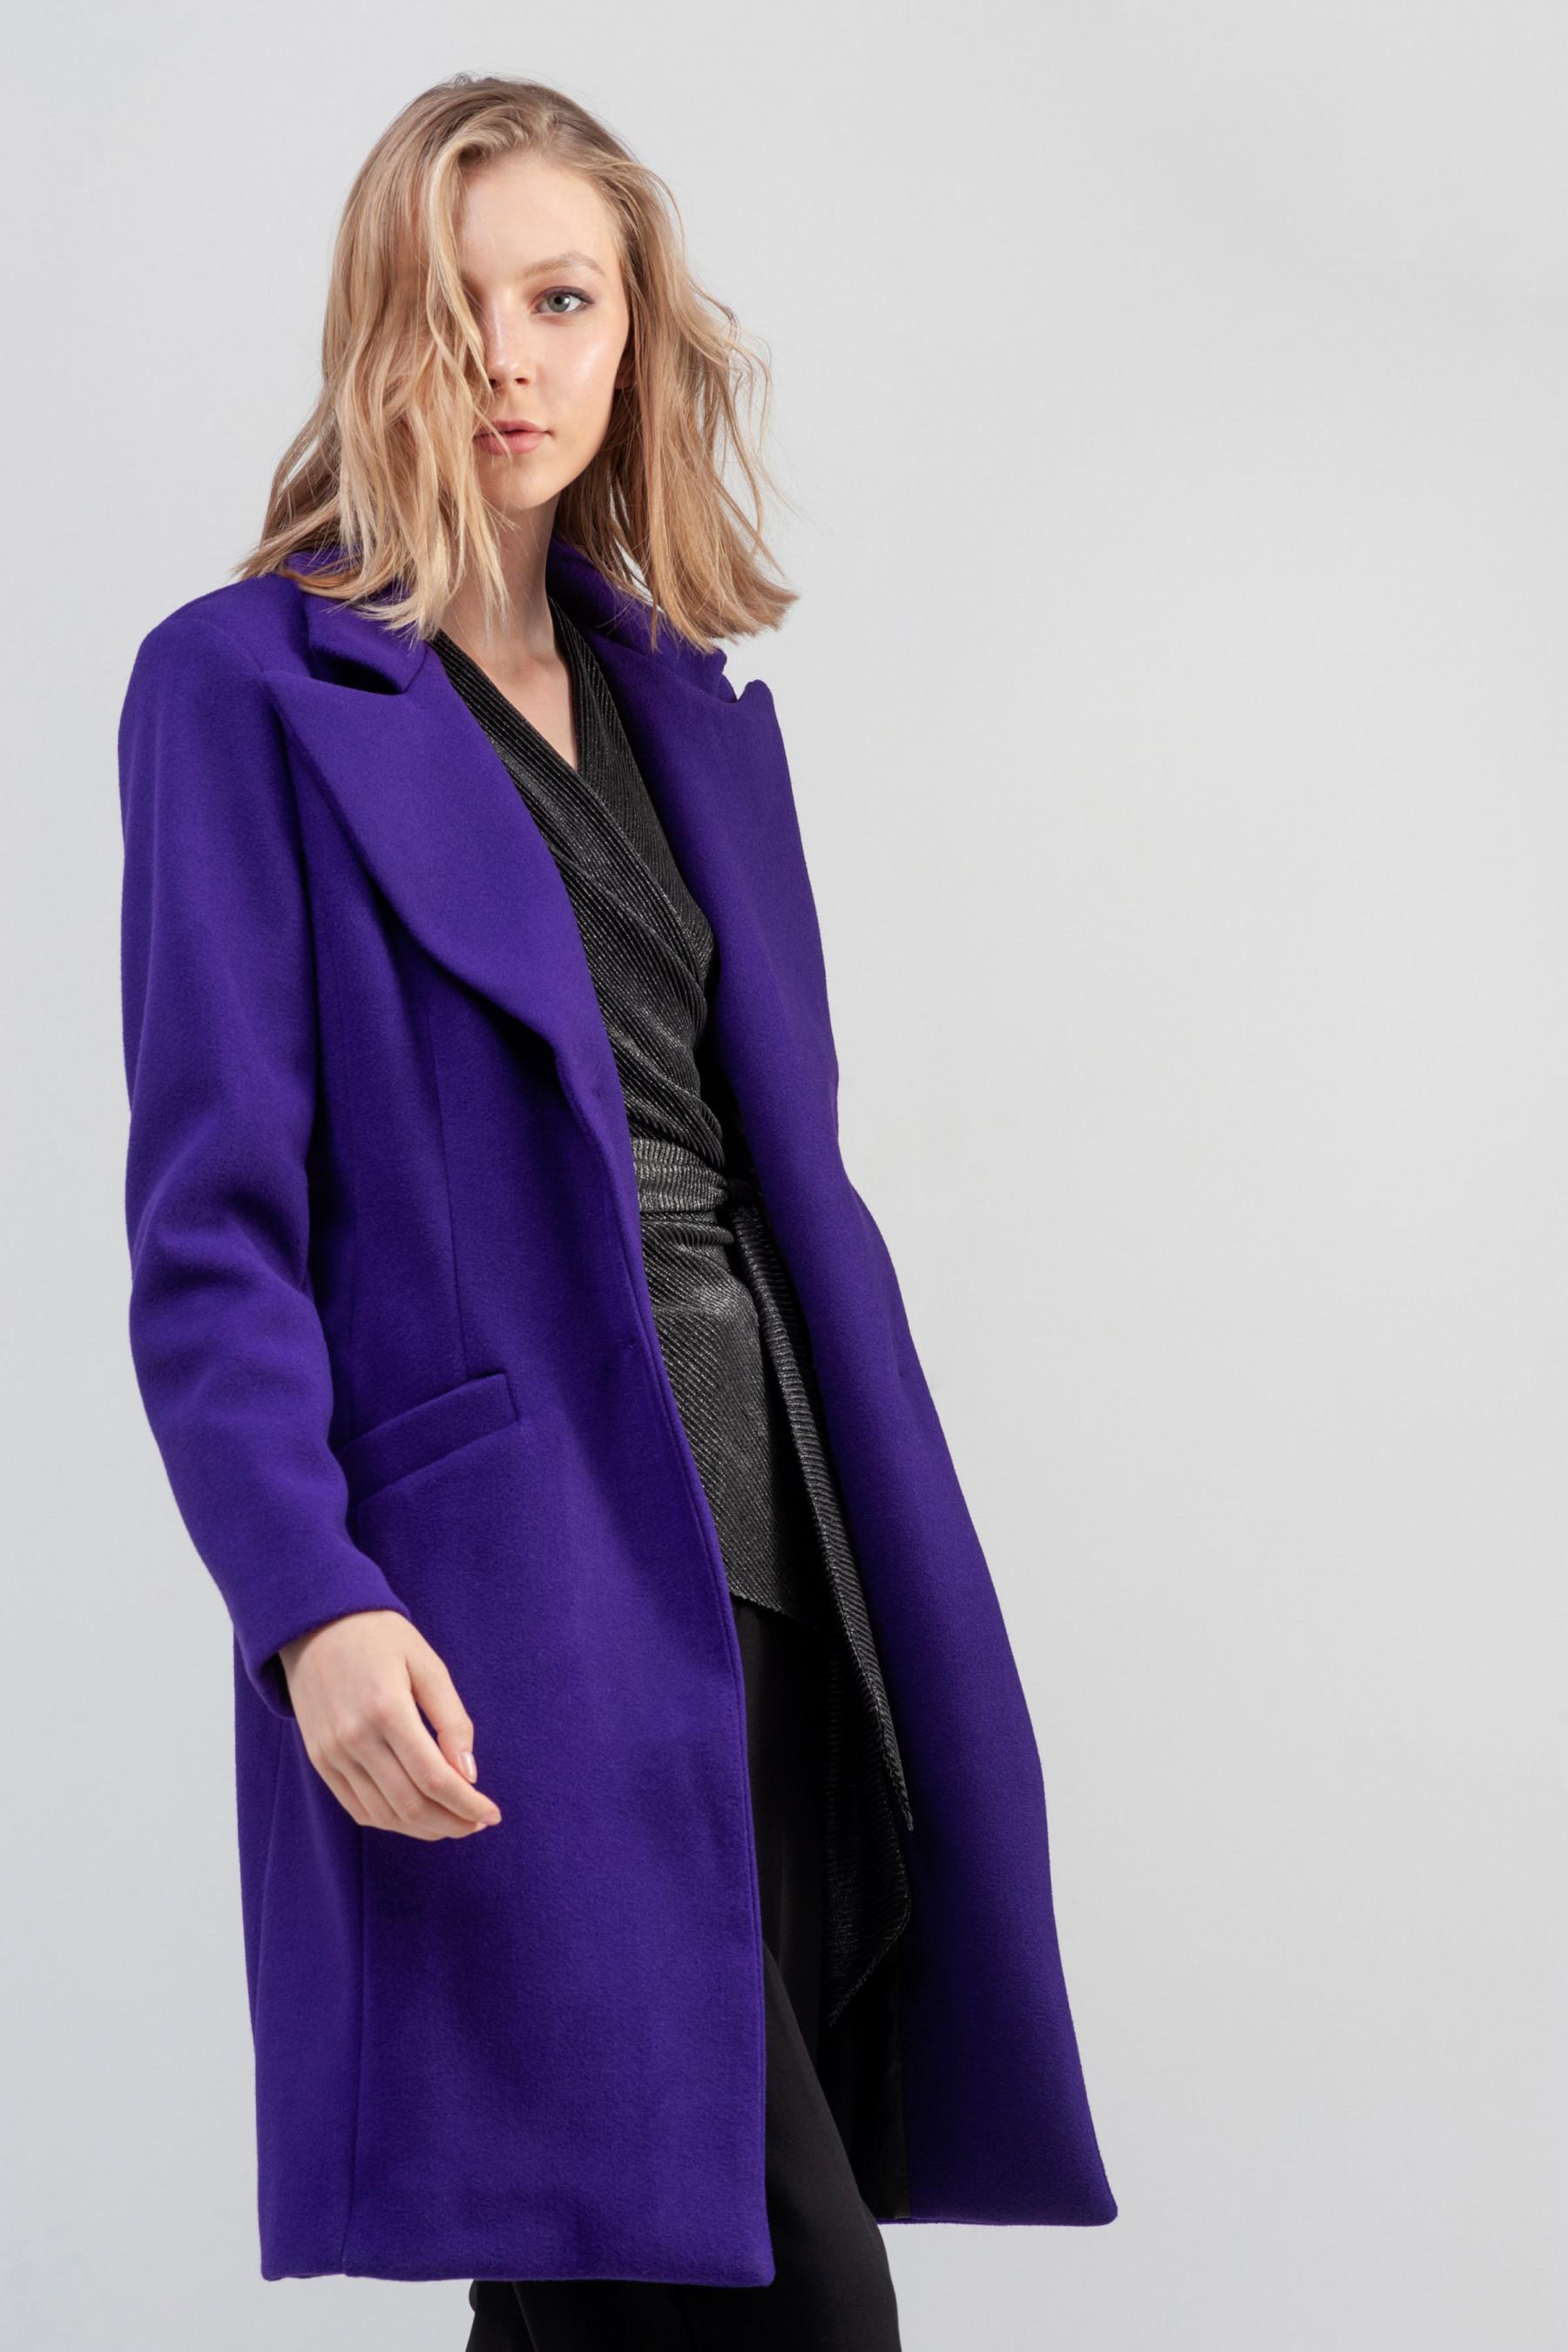 Warm Up Your Winter: Συνδύασε attrattivo πουλόβερ με πανωφόρι παραμένοντας ζεστή και κομψή